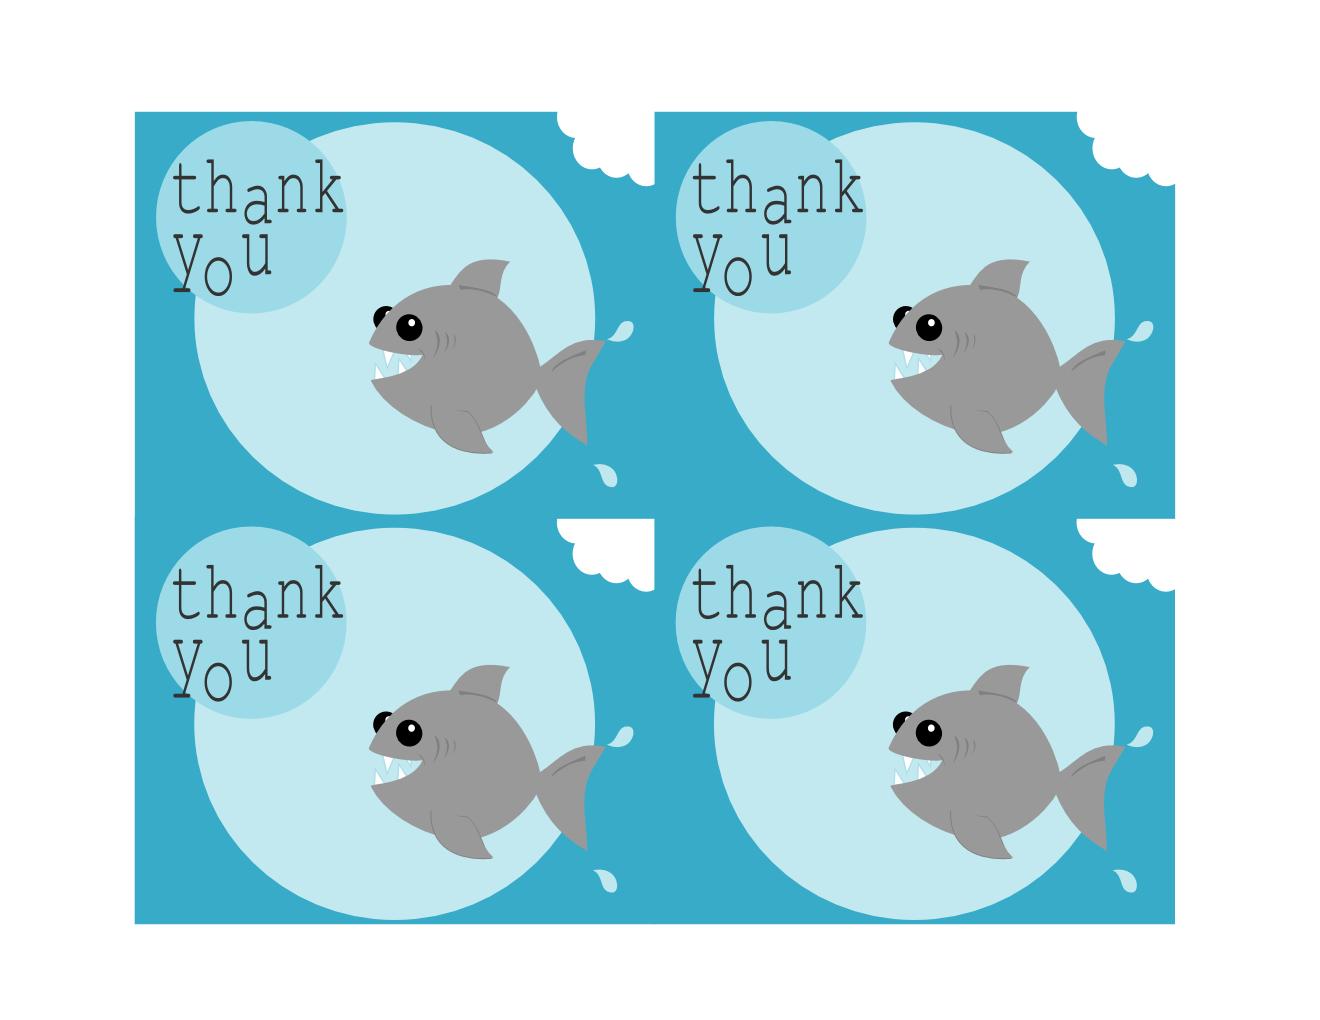 F6cde9bd0349451c82dcc4931a7e41d6 Jpg 1 320 1 020 Pixels Shark Birthday Party Pool Birthday Party Sea Birthday Party